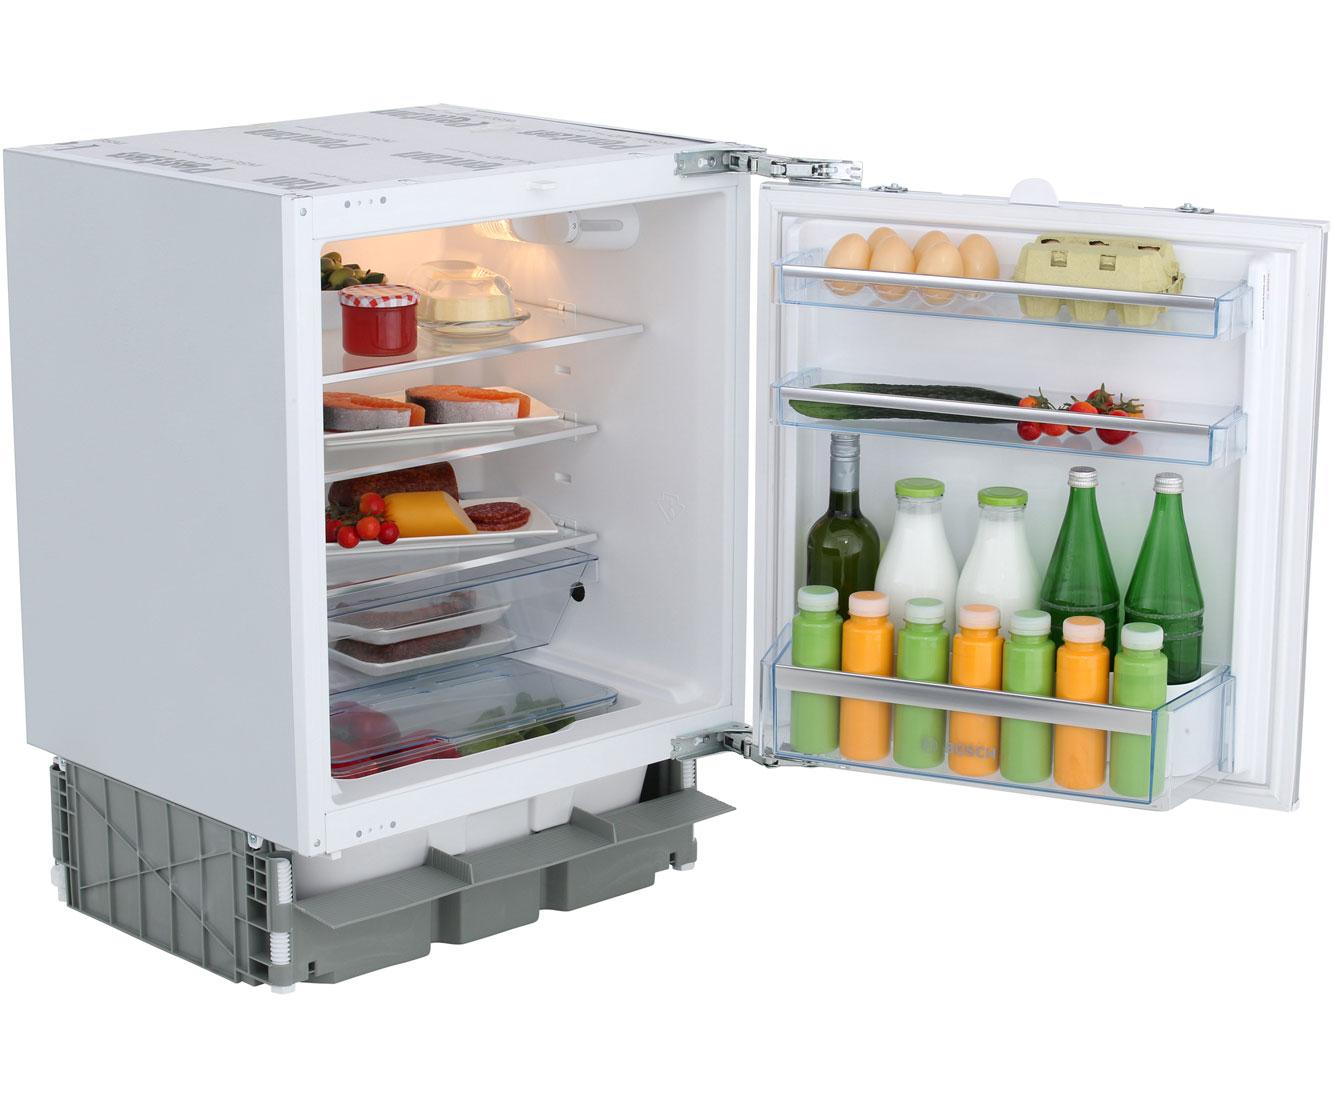 Bosch Kühlschrank Vergleich : Bosch serie kur a einbau kühlschrank er nische festtür